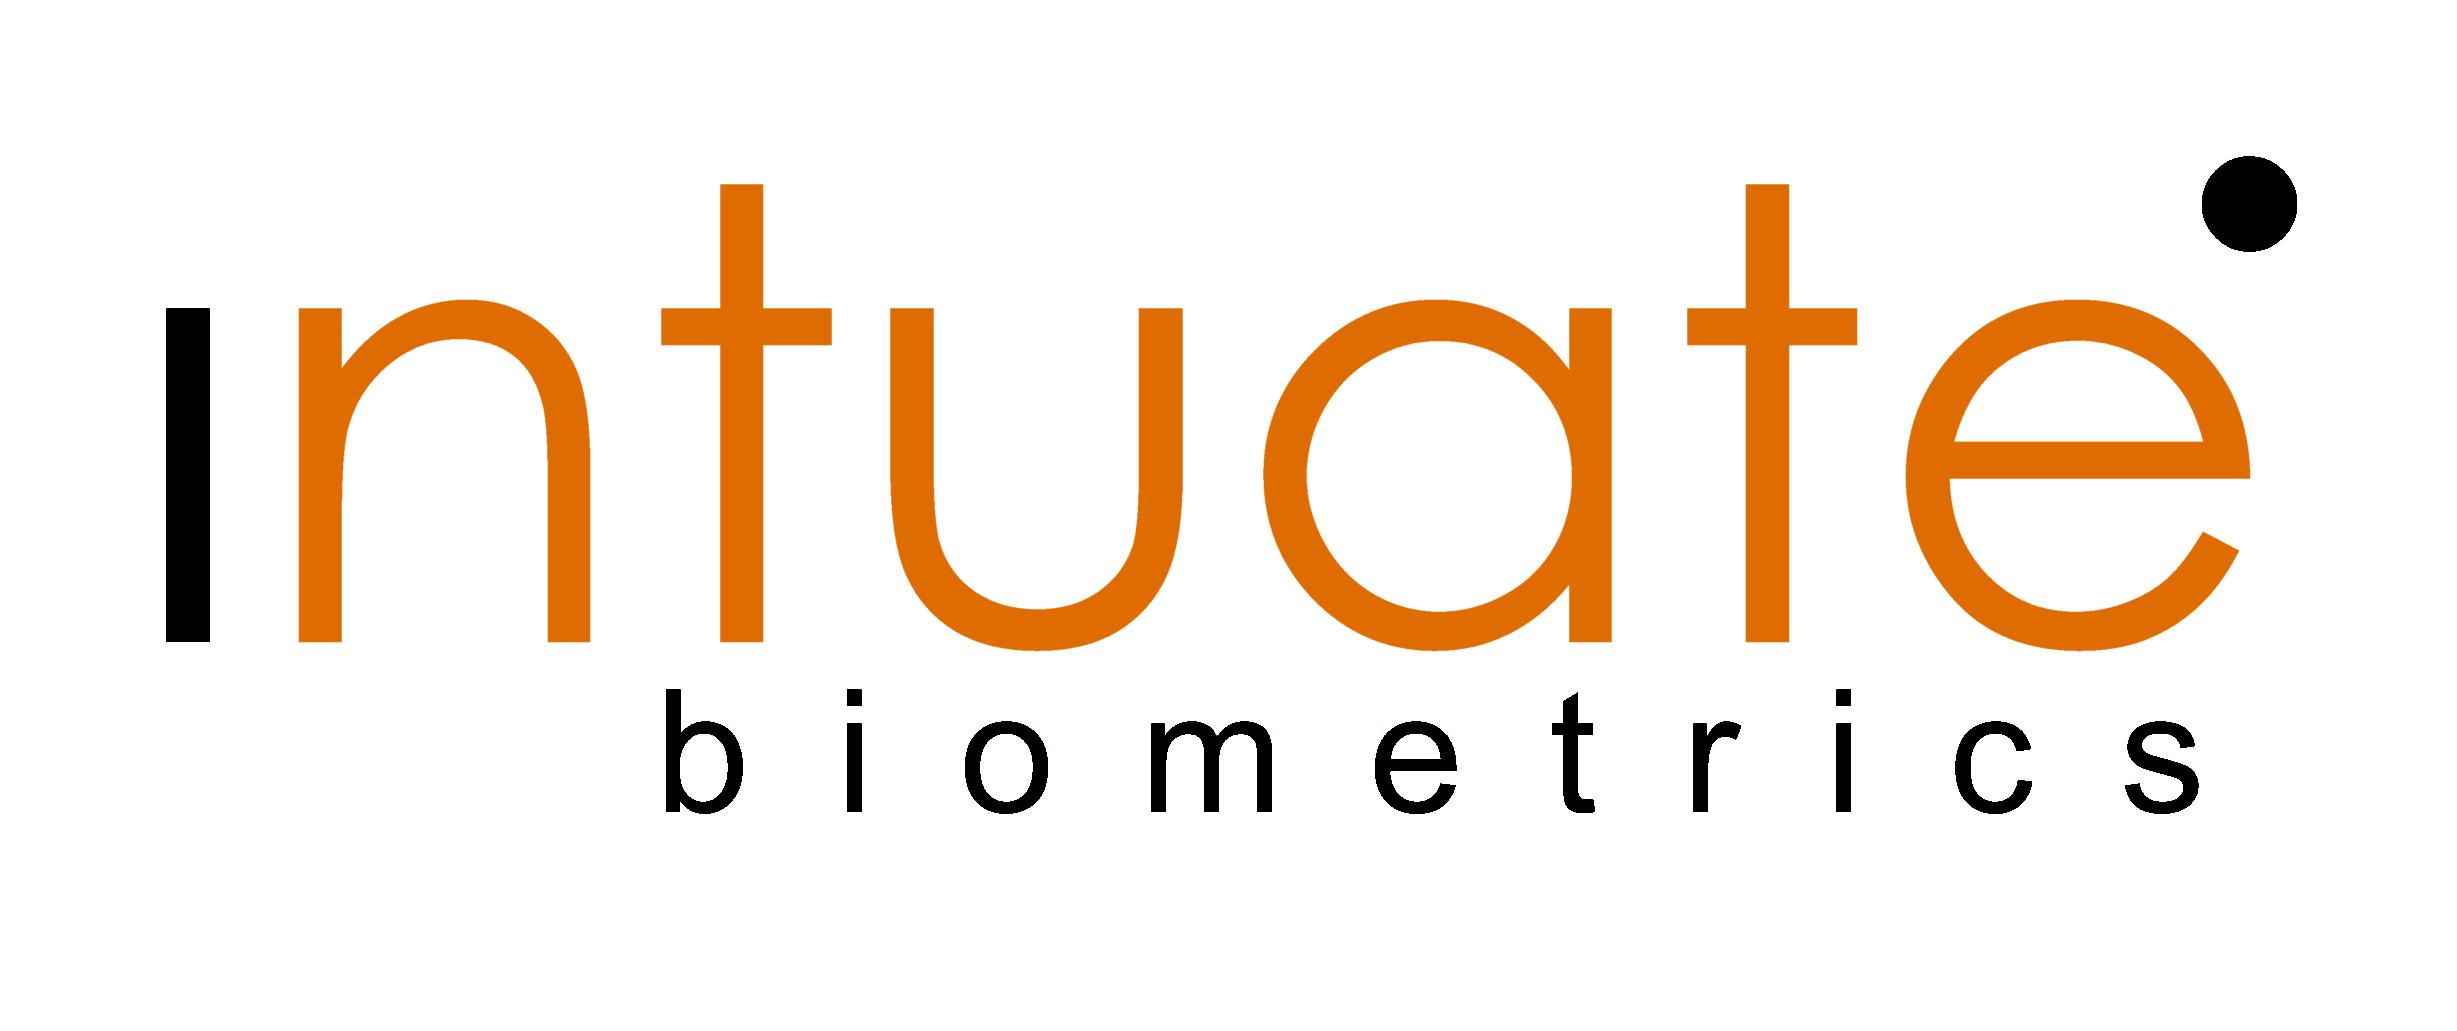 Intuate biometrics